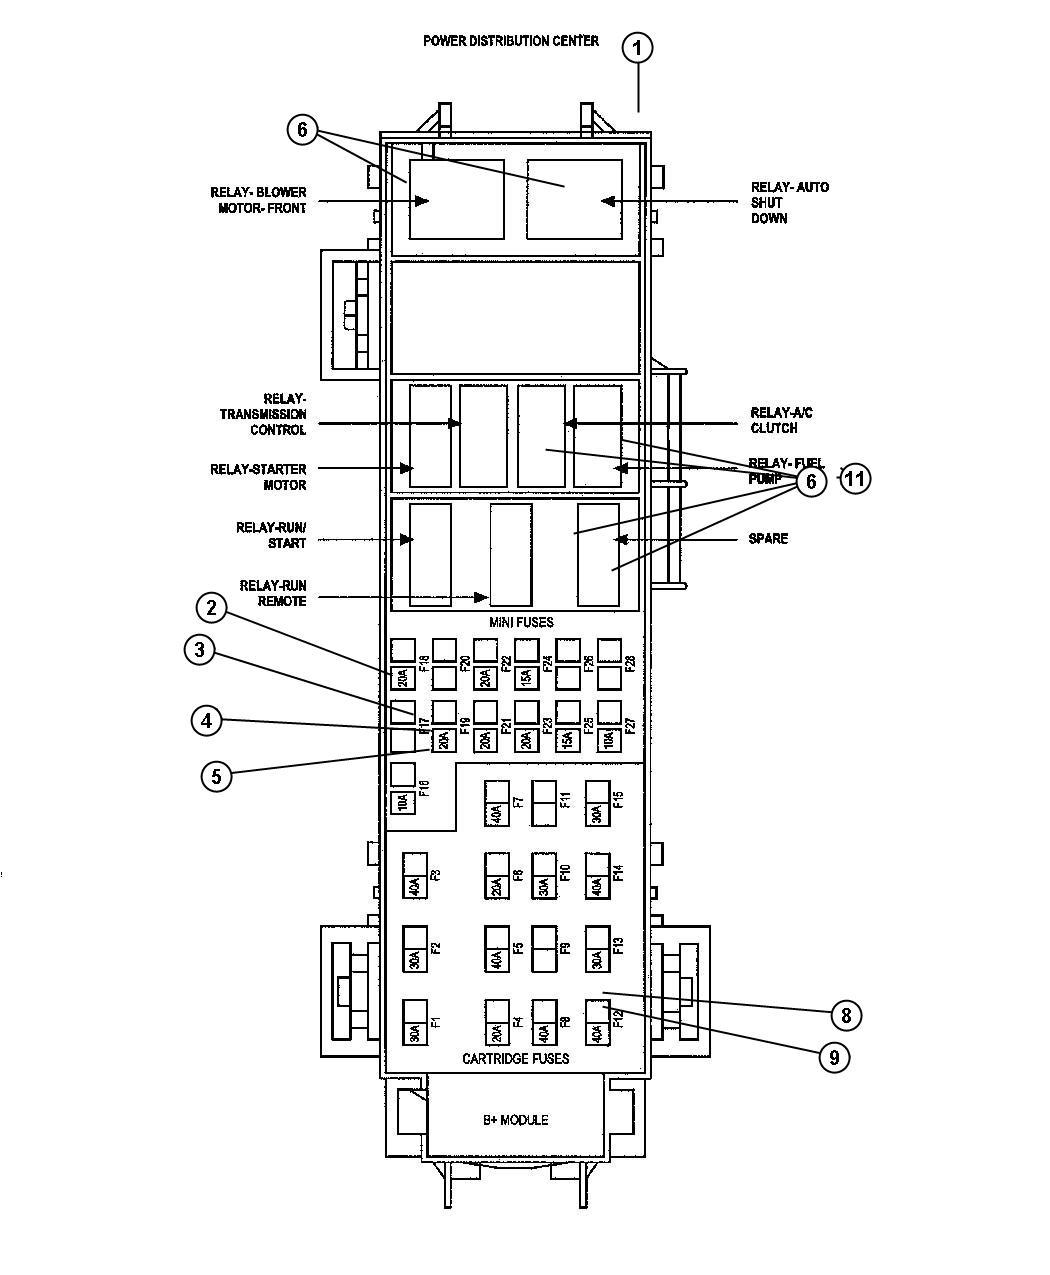 2001 Chrysler Sebring Fuse Diagram